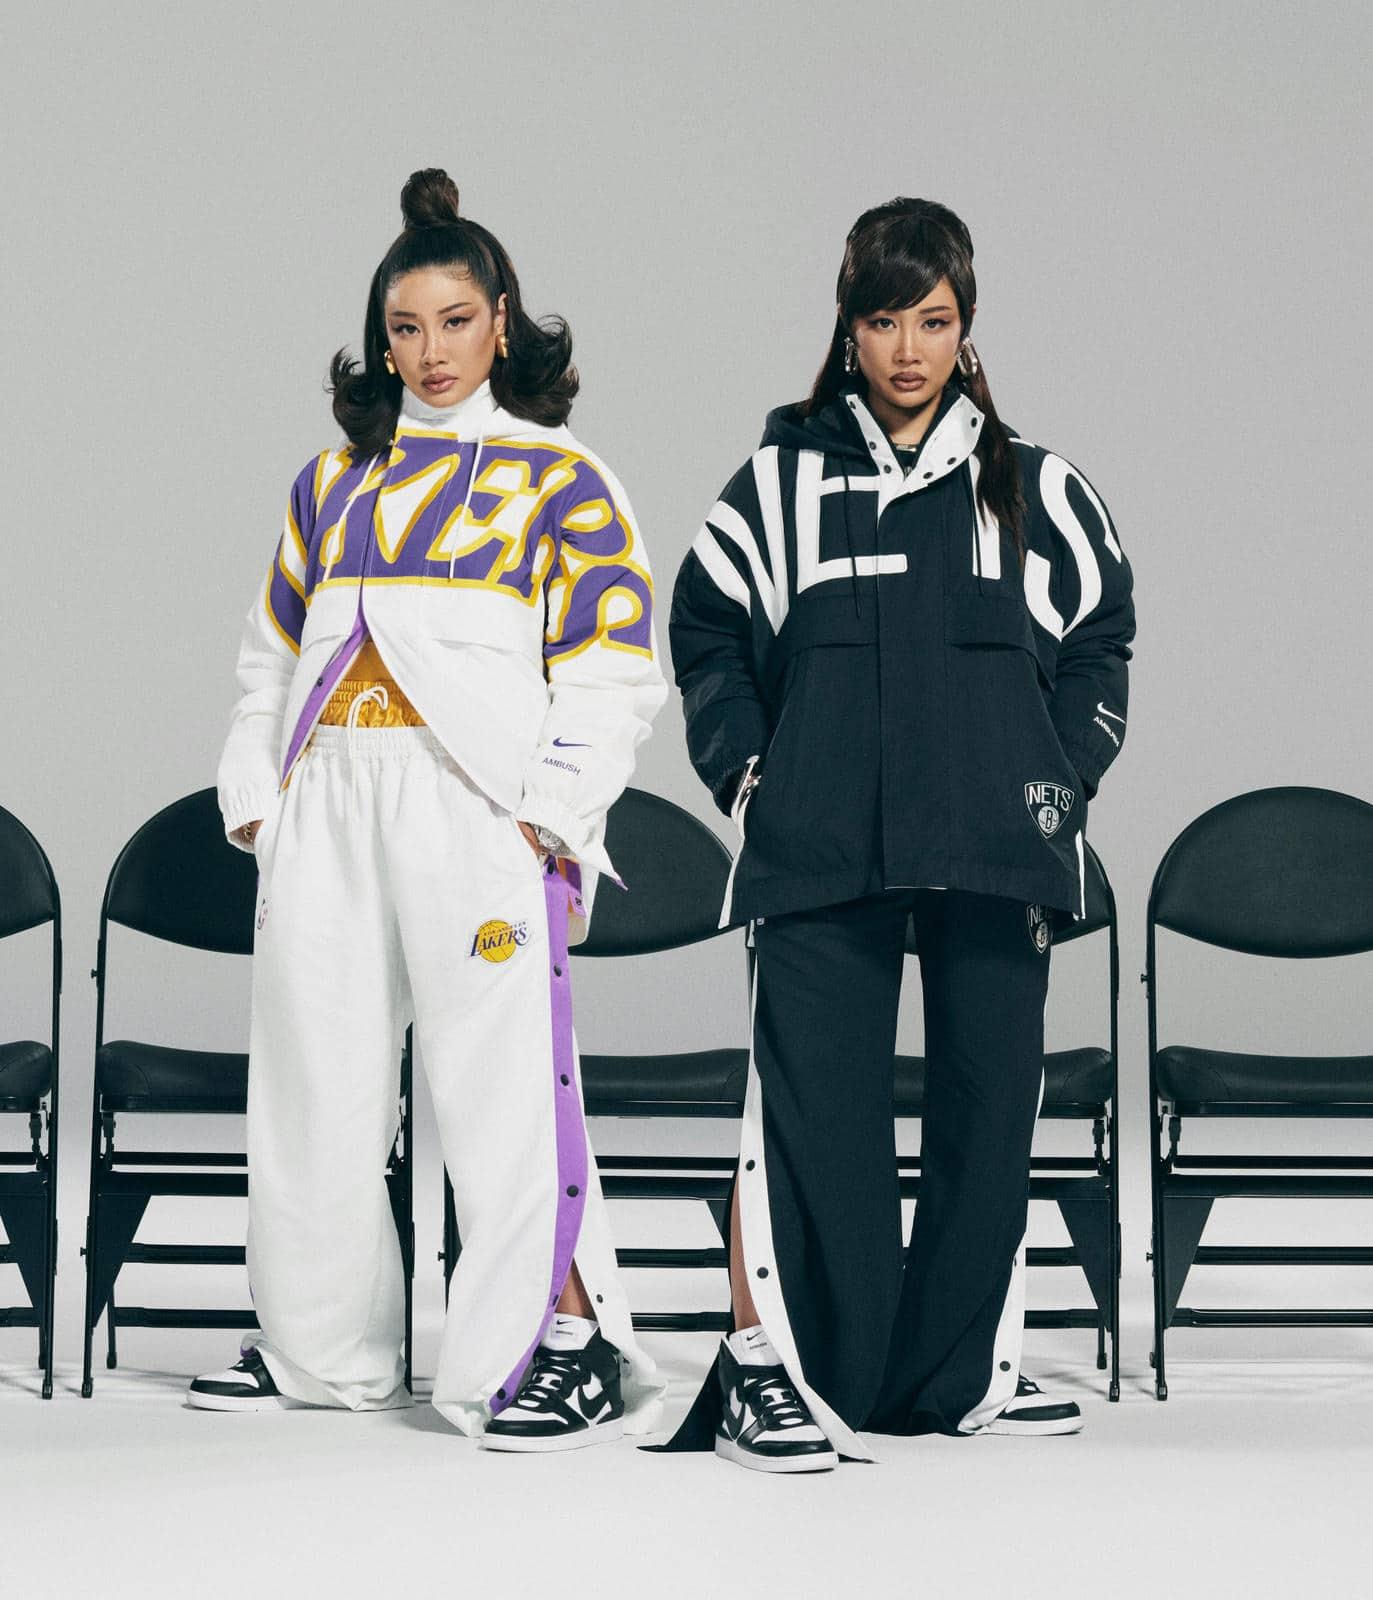 Одежда Lakers и Nets